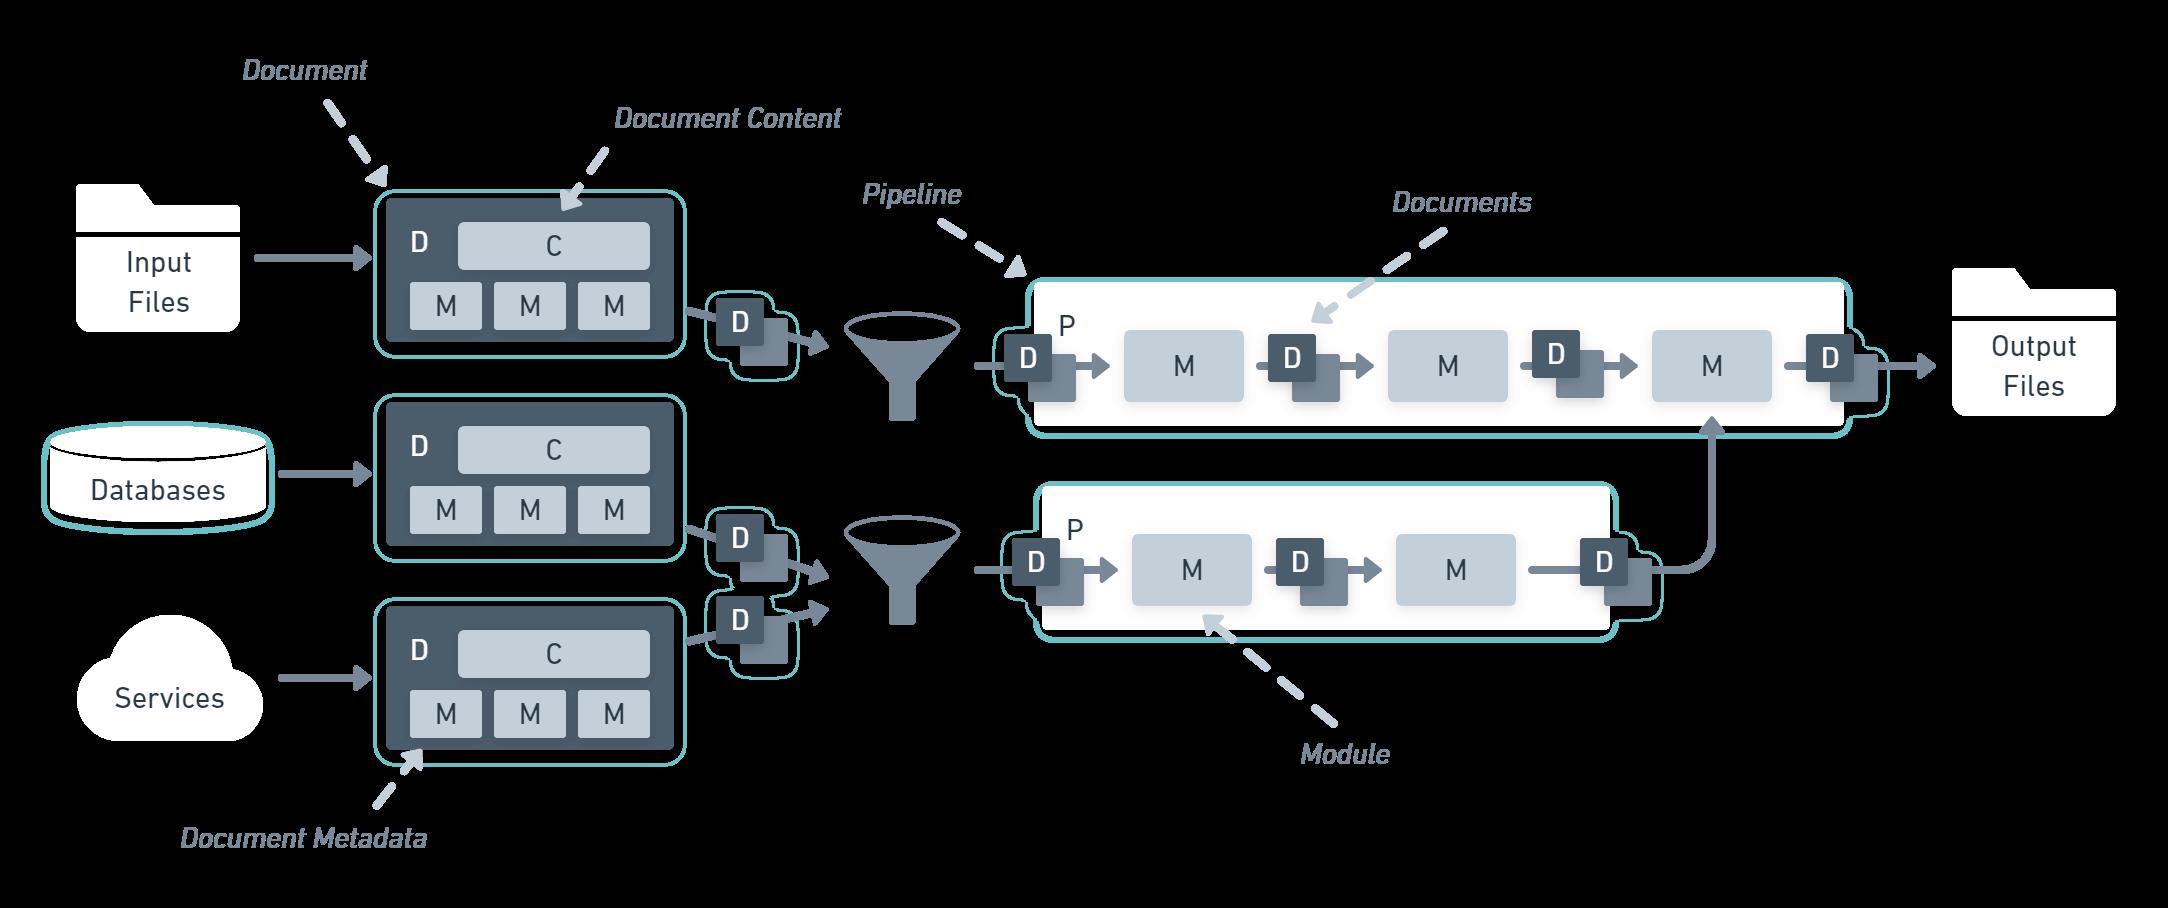 Example flow of documents through Statiq